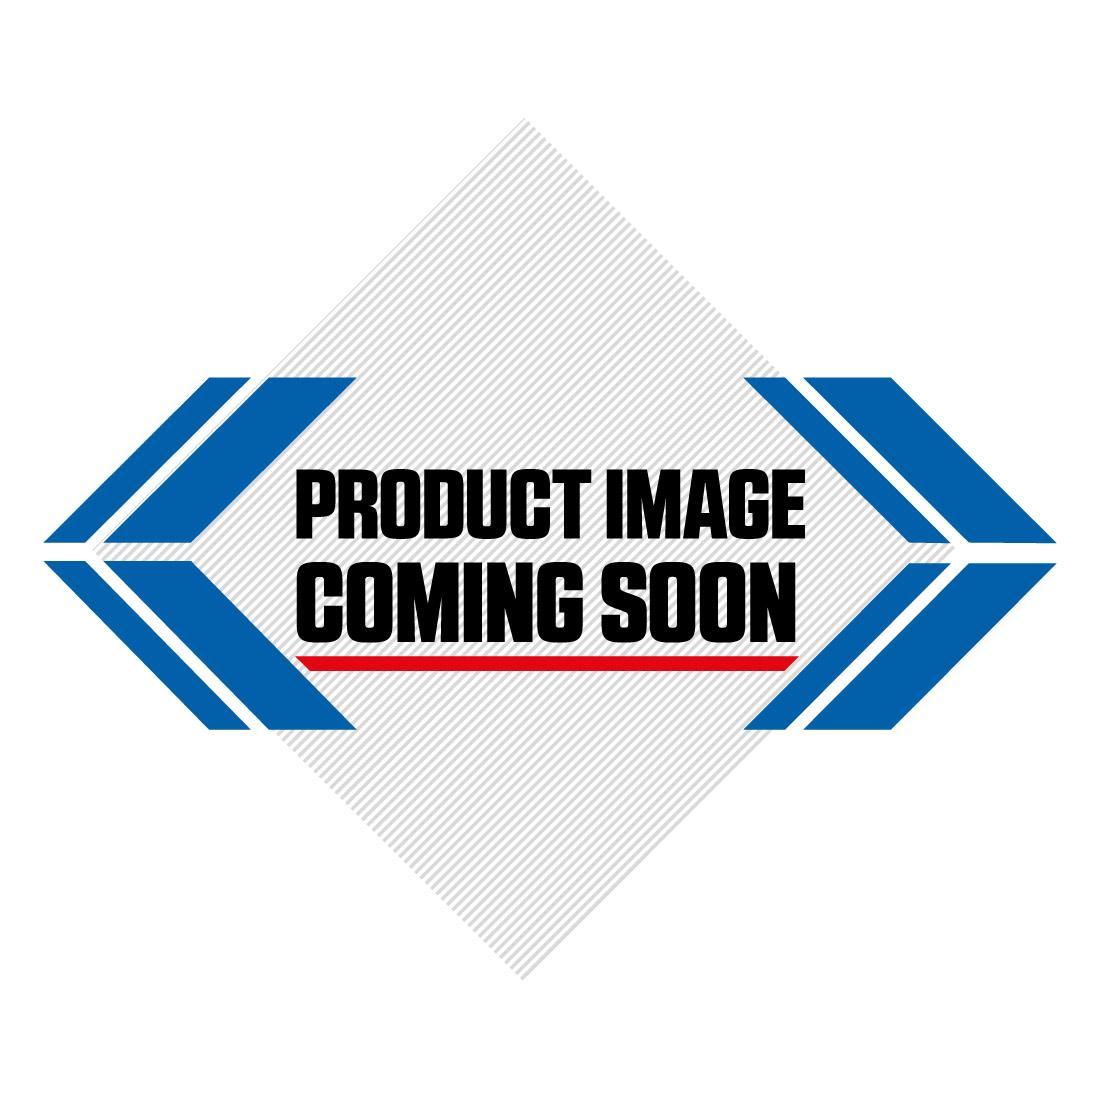 DJI Mavic Pro Fly More Combo 4K Quadcopter Drone Image-2